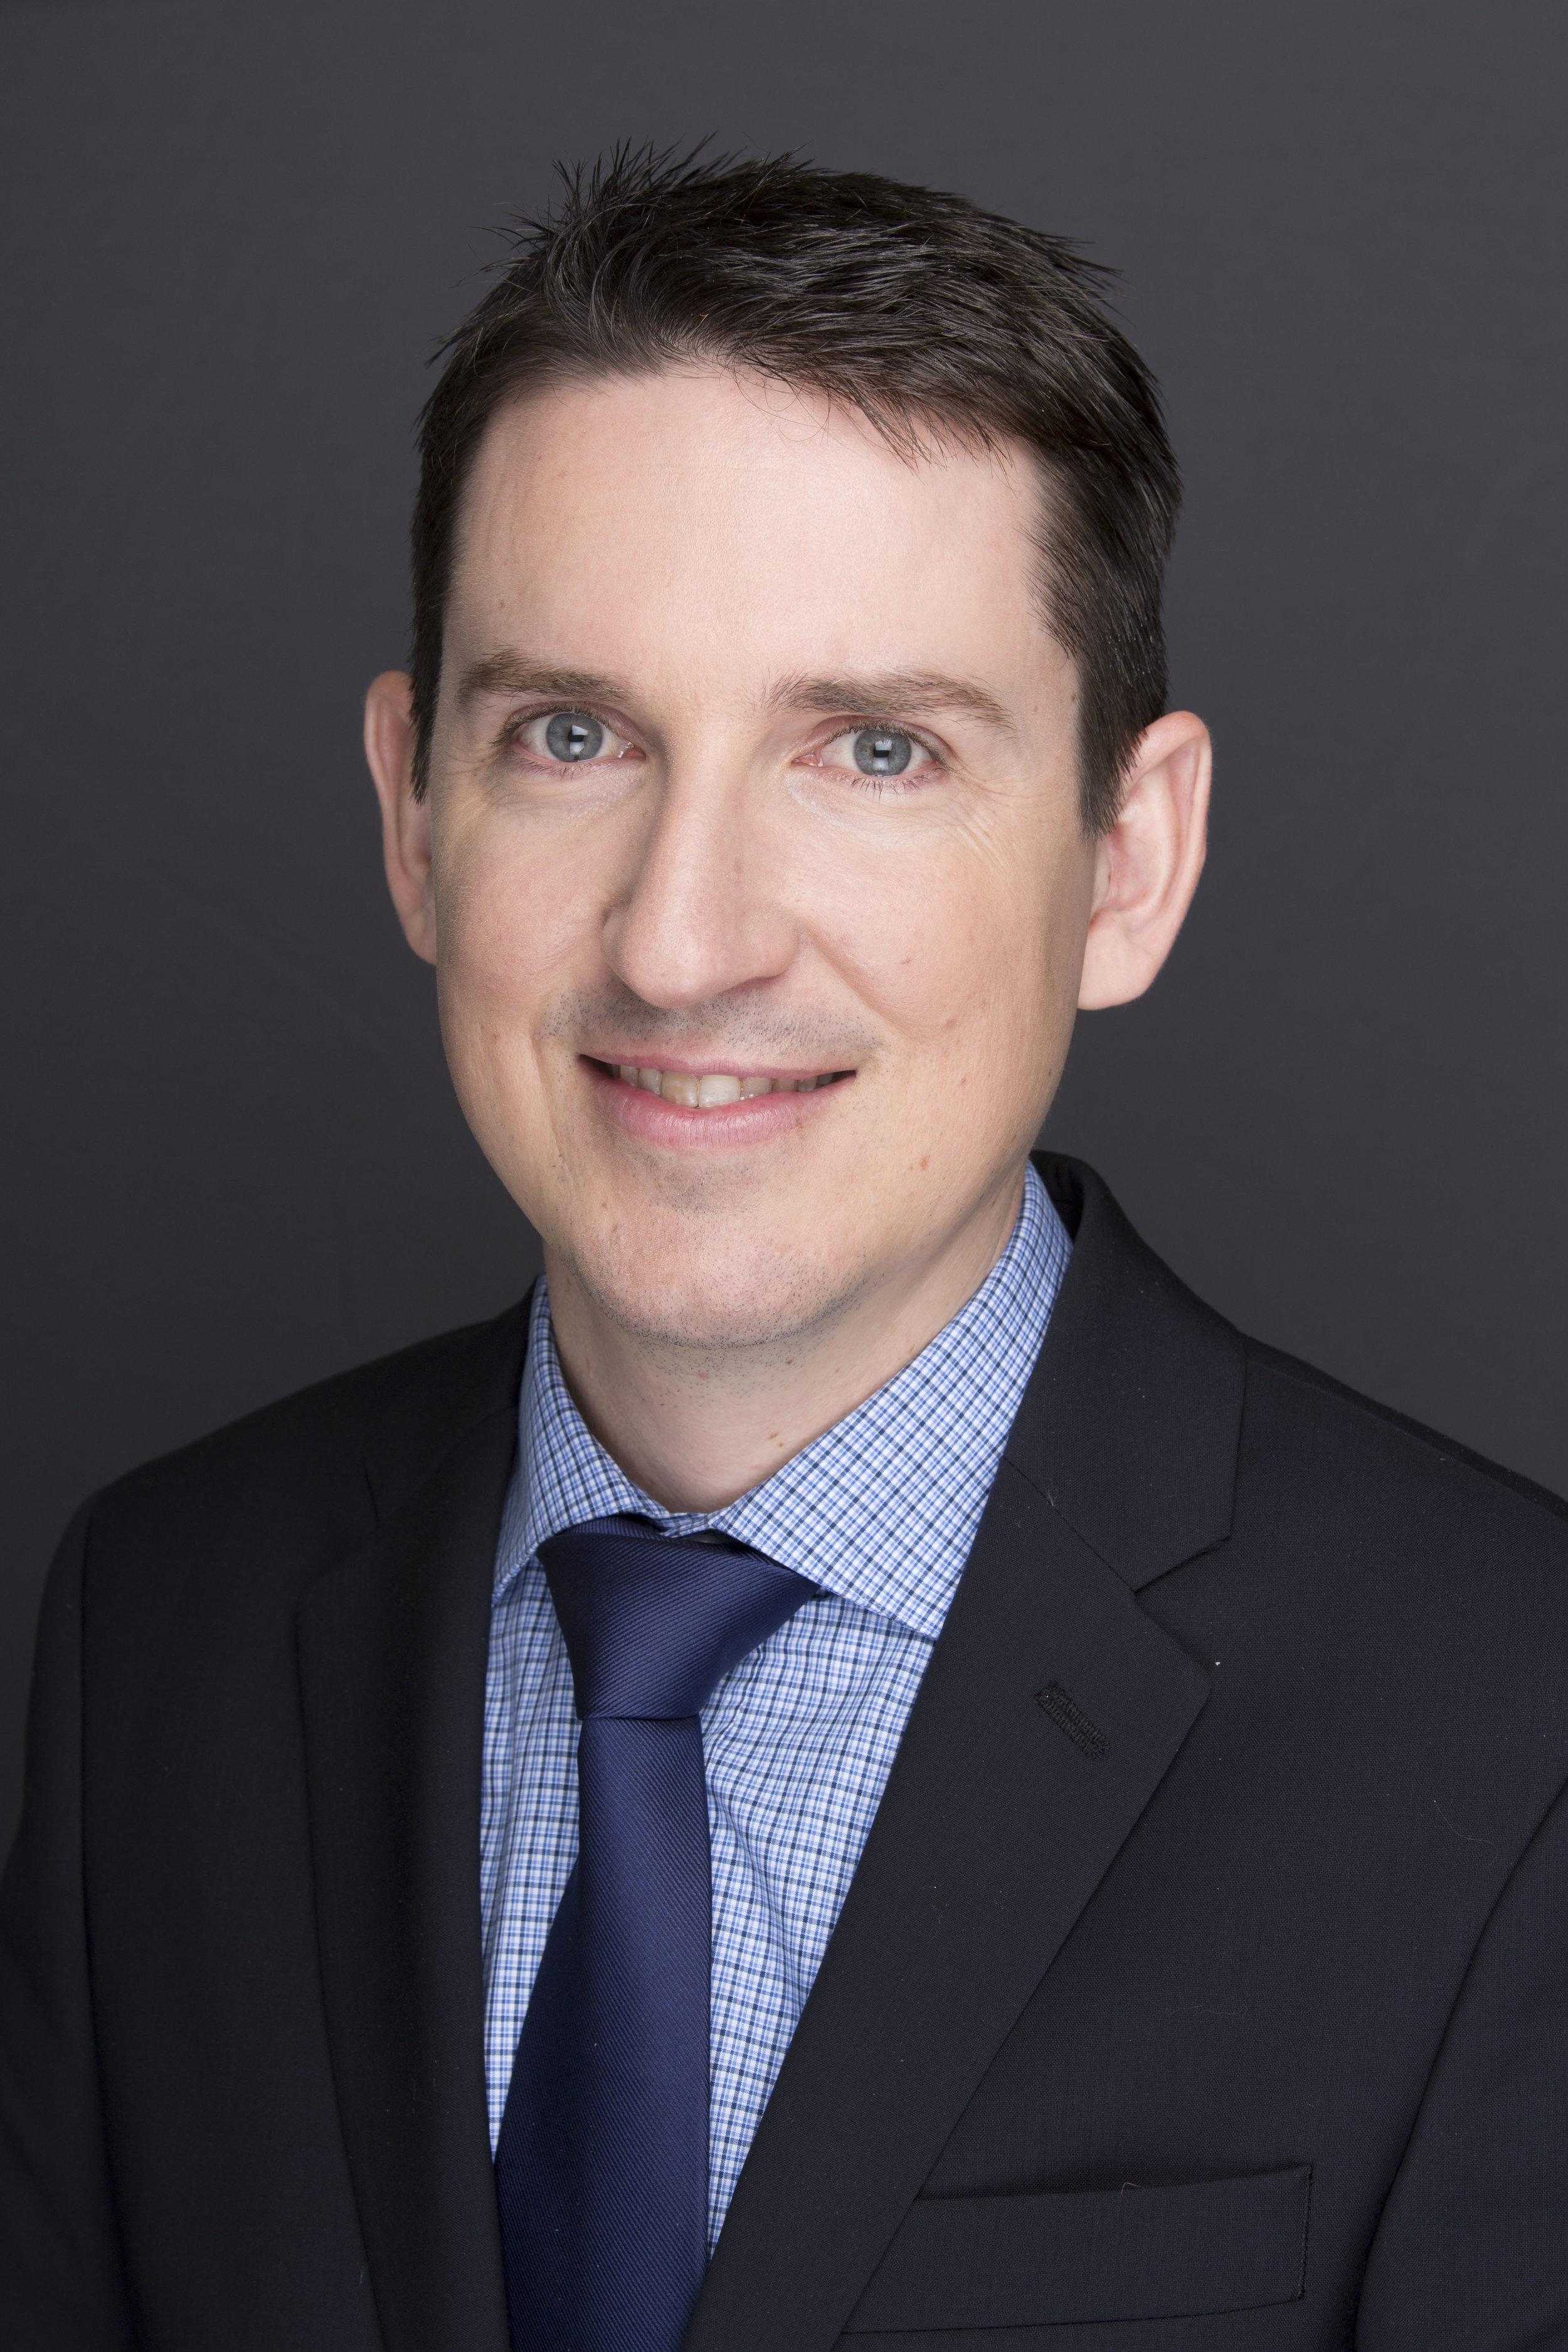 Chris Wilkinson - PartnerE cdw@bwslawyers.com.auP 02 9394 1036